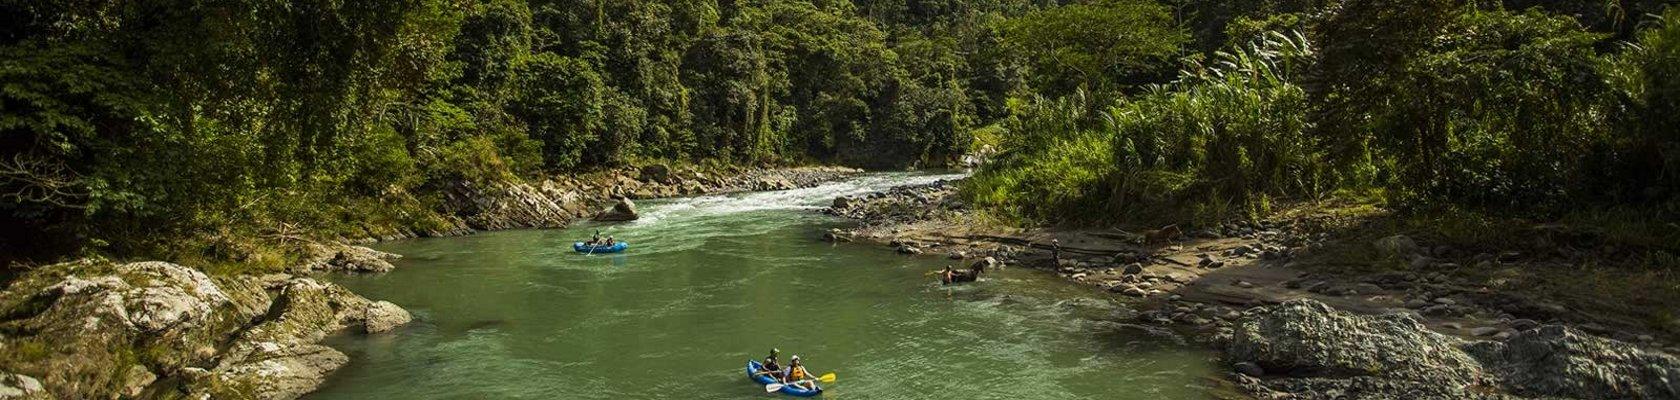 Raften over de Pacuare-rivier